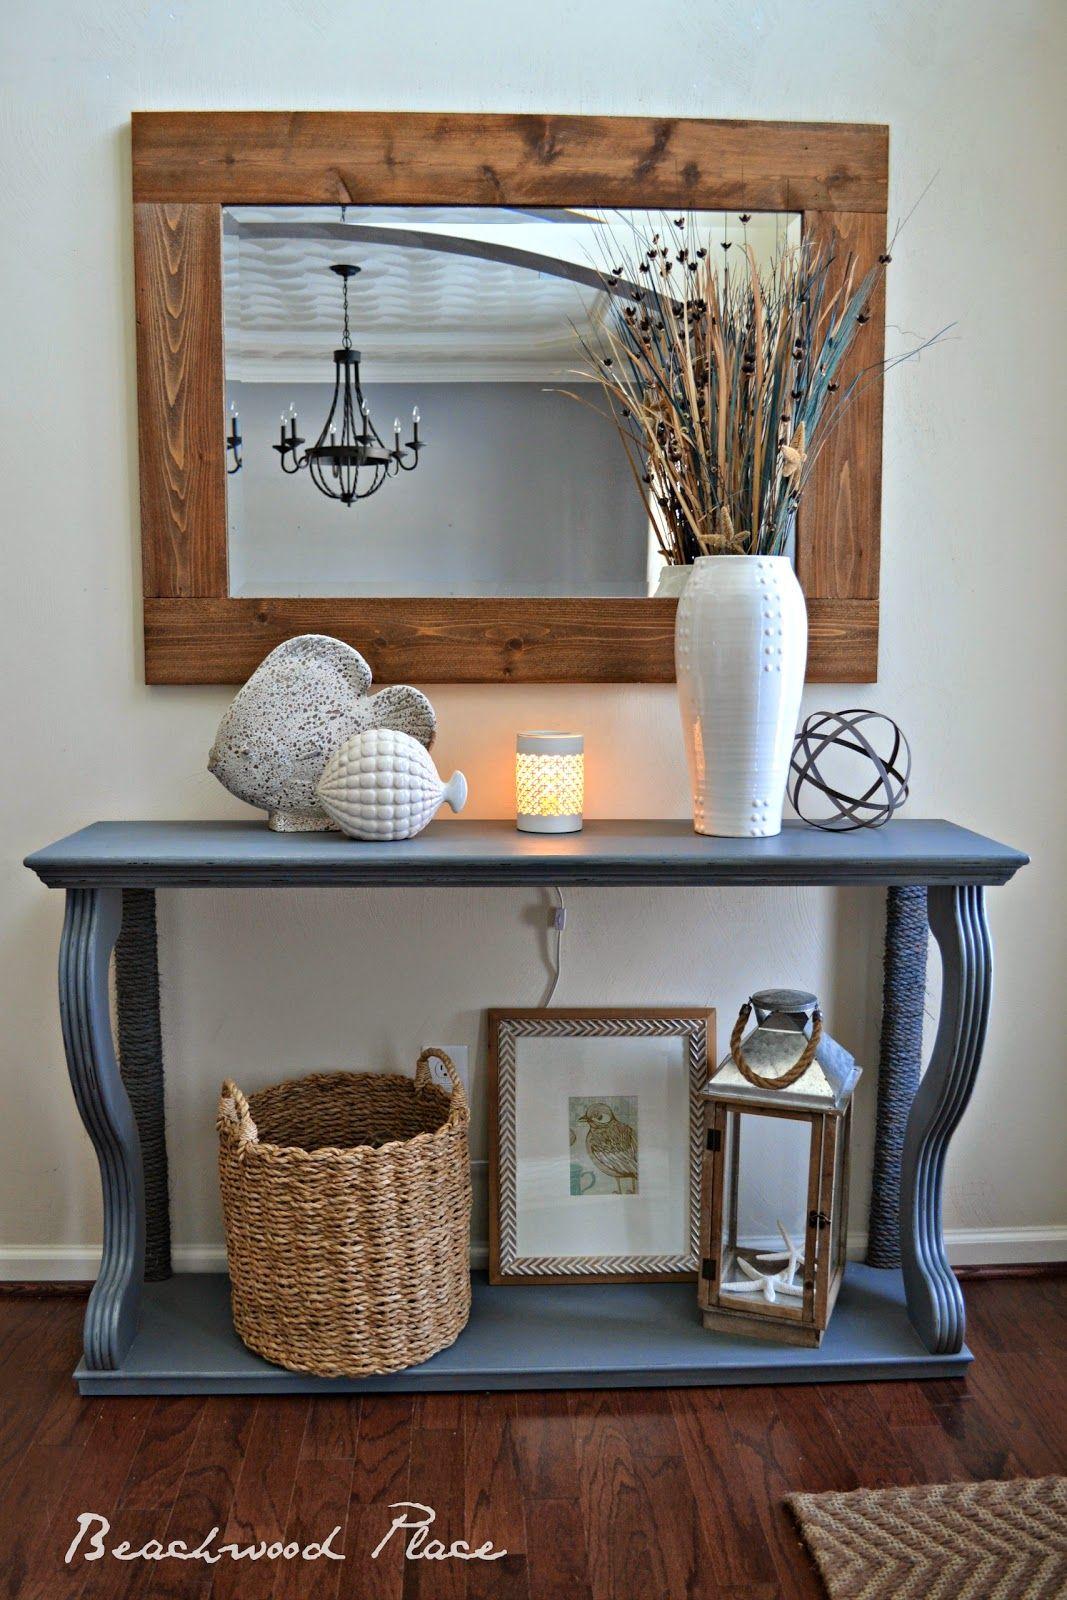 Beachwood Place Is a design blog featuring interior design ...